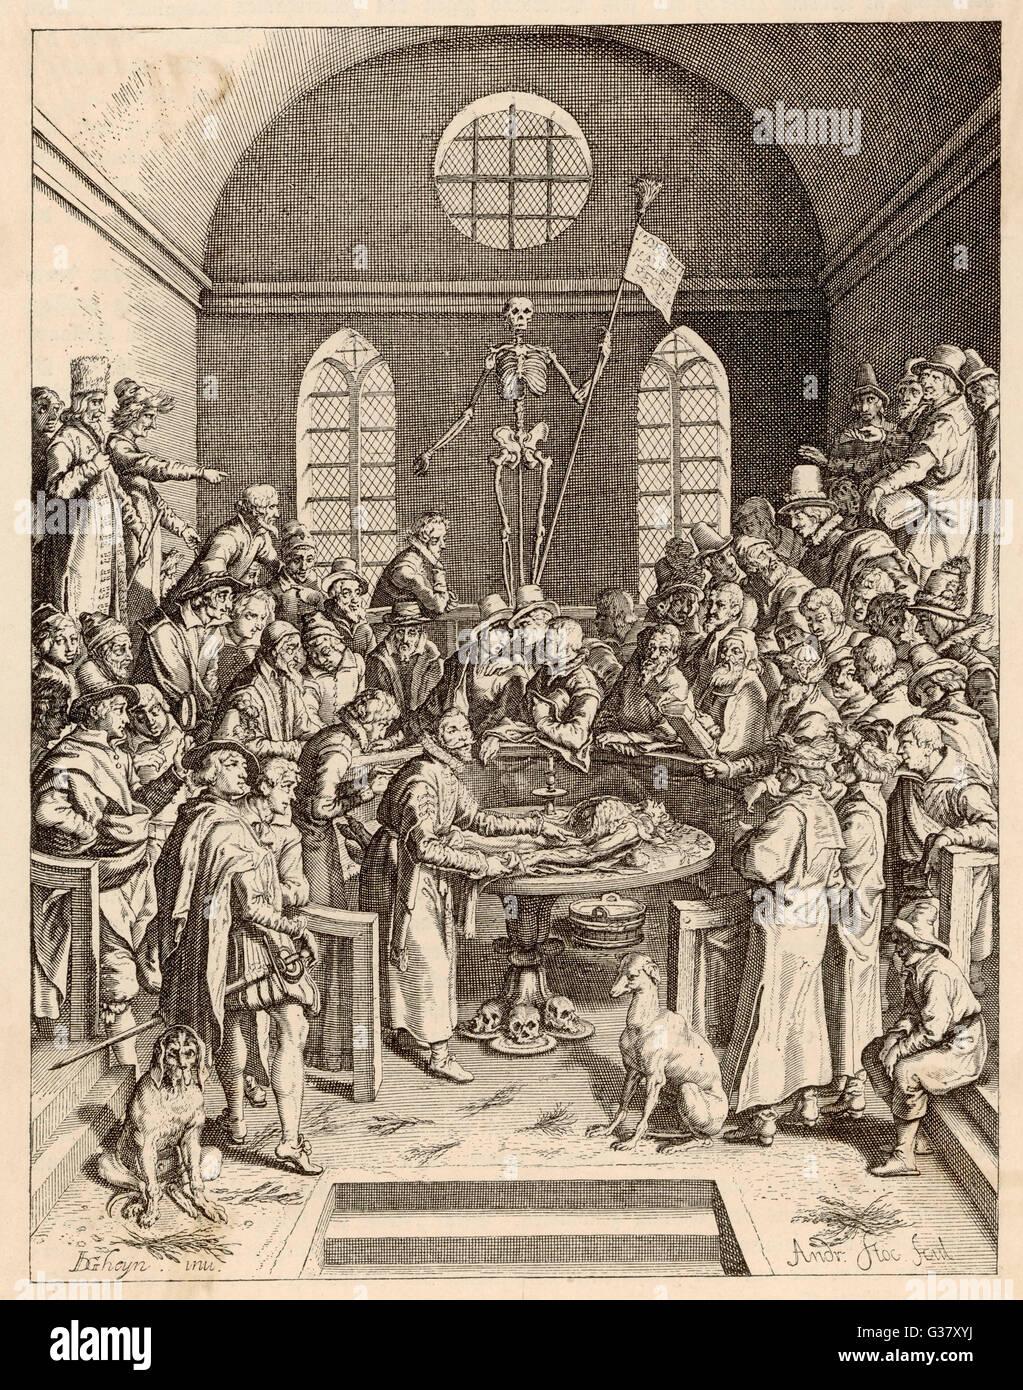 Démonstration d'anatomie. Date: 16e siècle Photo Stock